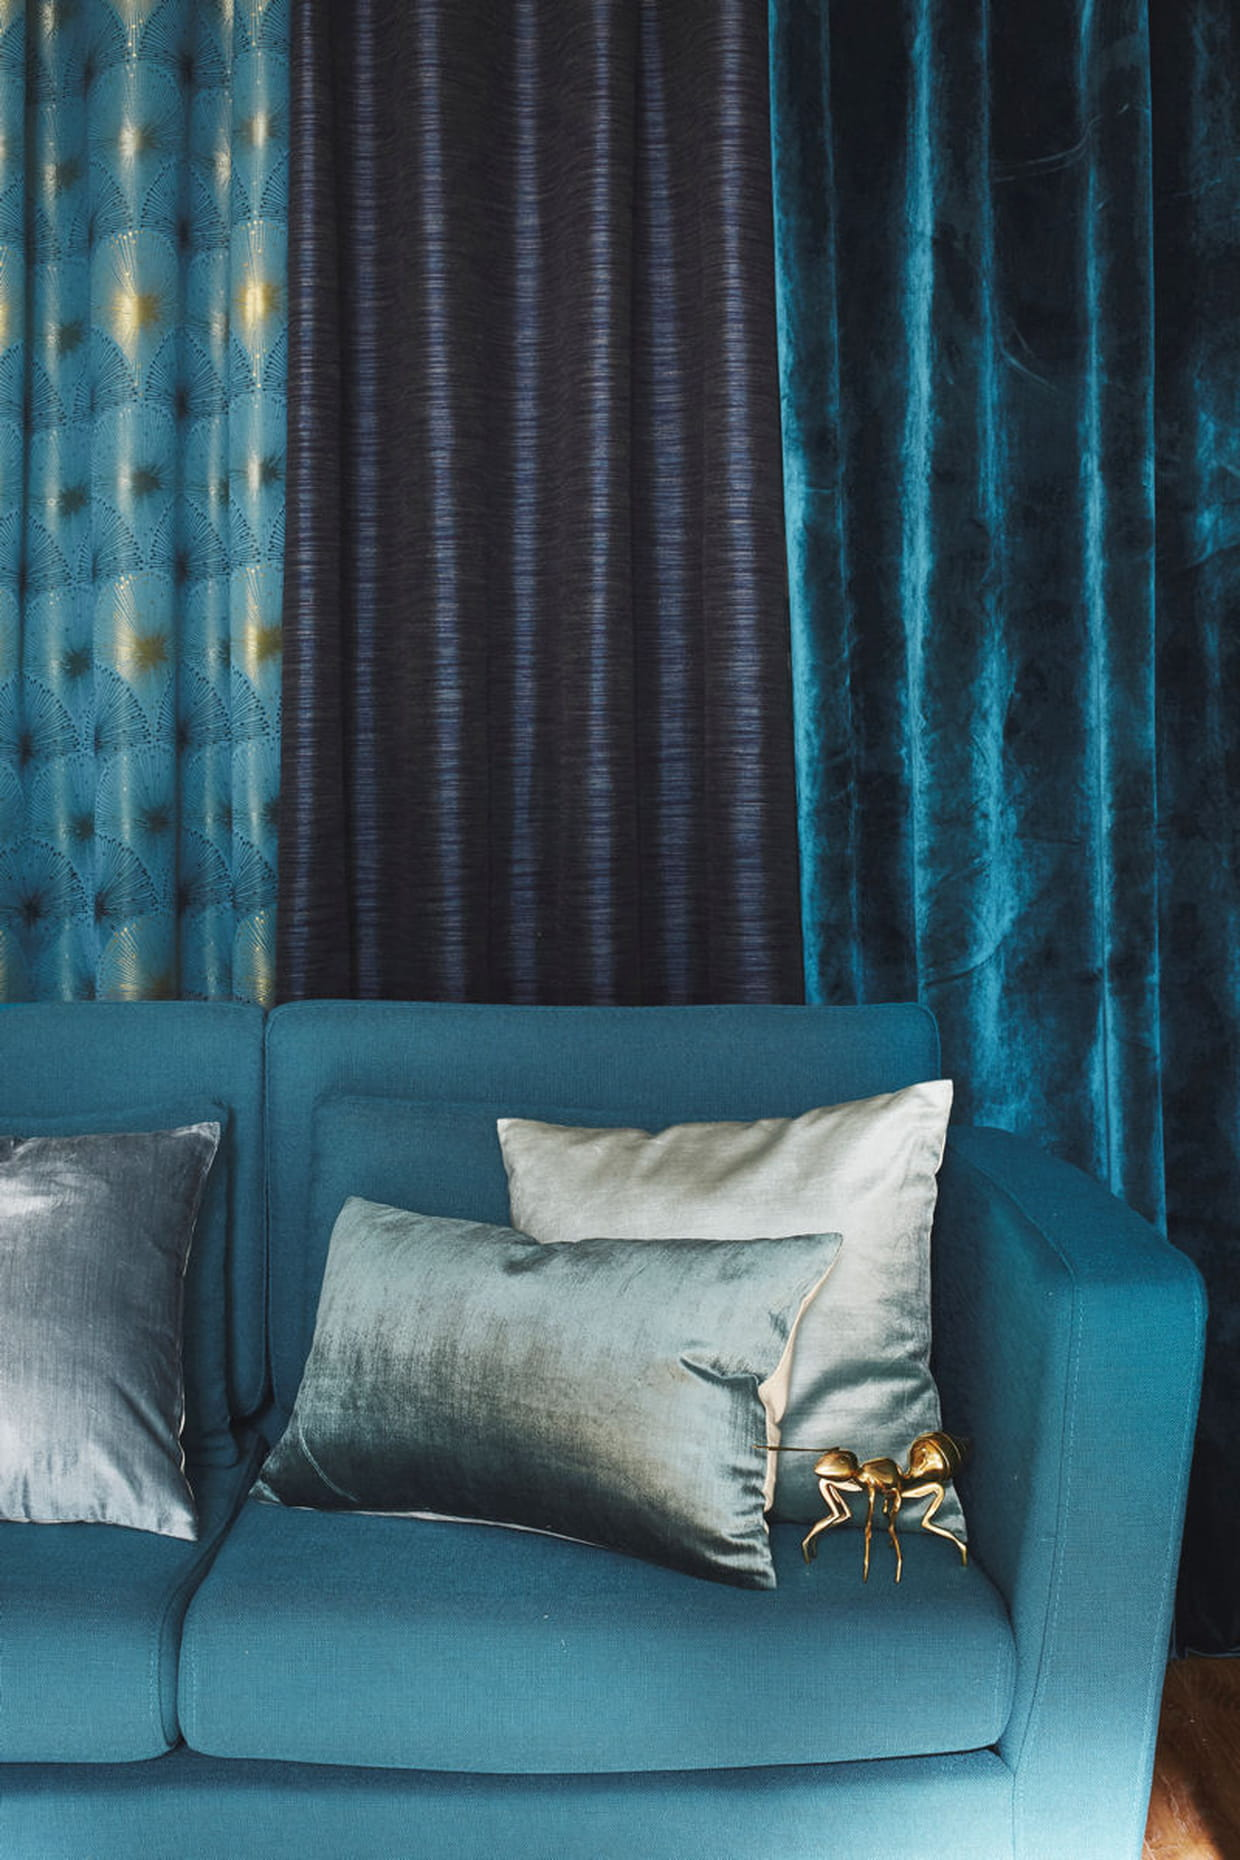 des rideaux tamisants. Black Bedroom Furniture Sets. Home Design Ideas